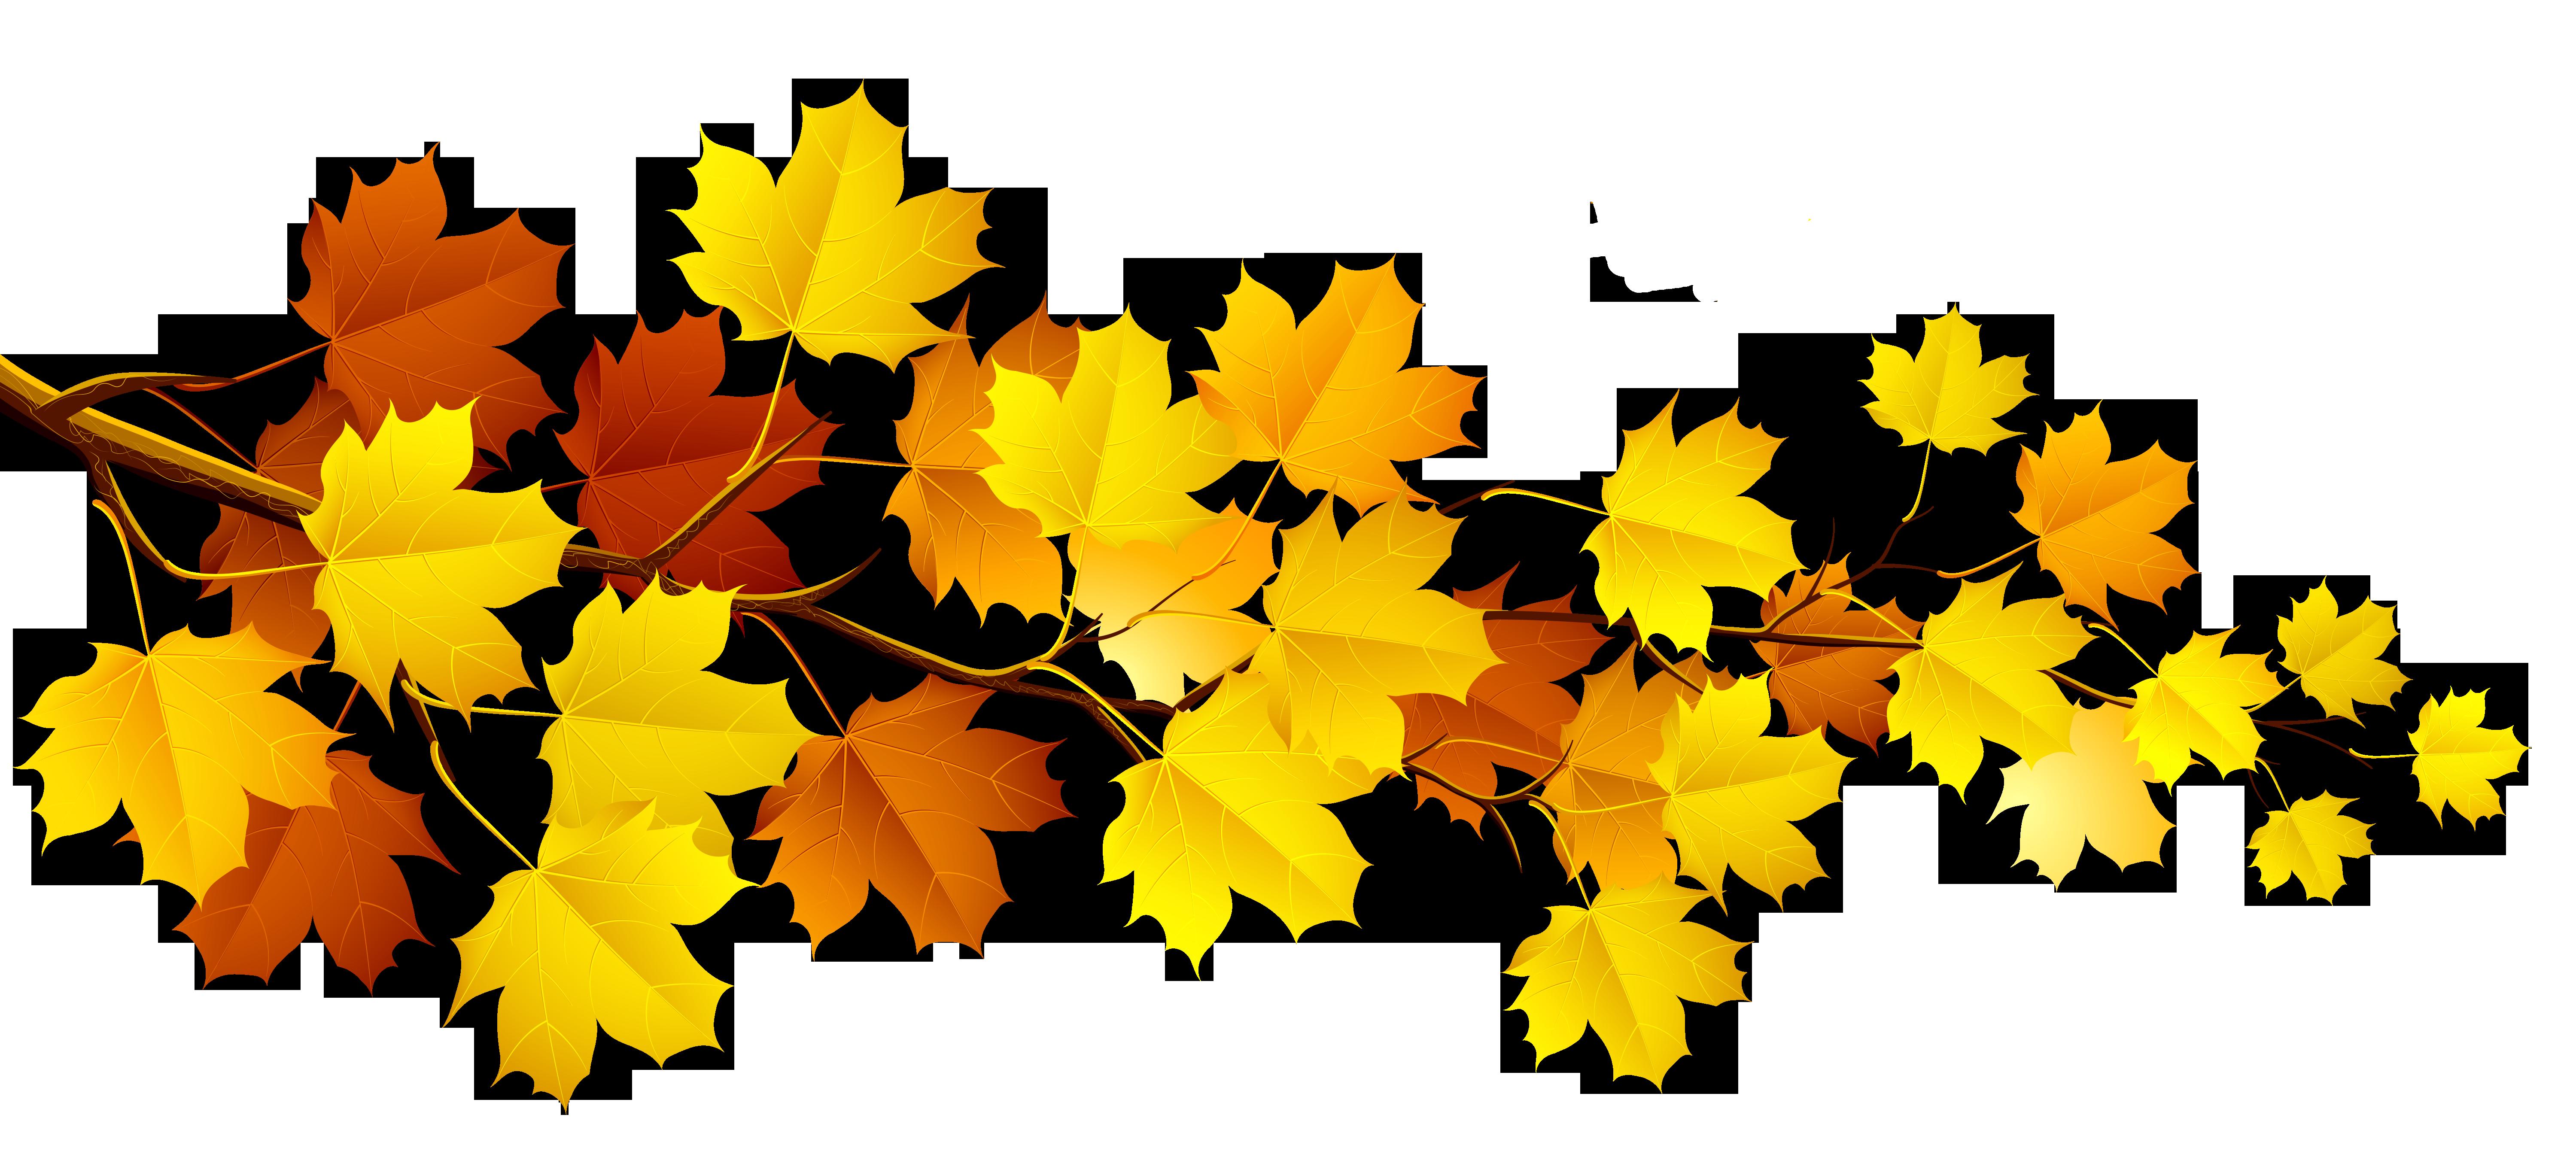 Leaves clipart autumn leaves Leaf clip images outline Autumn